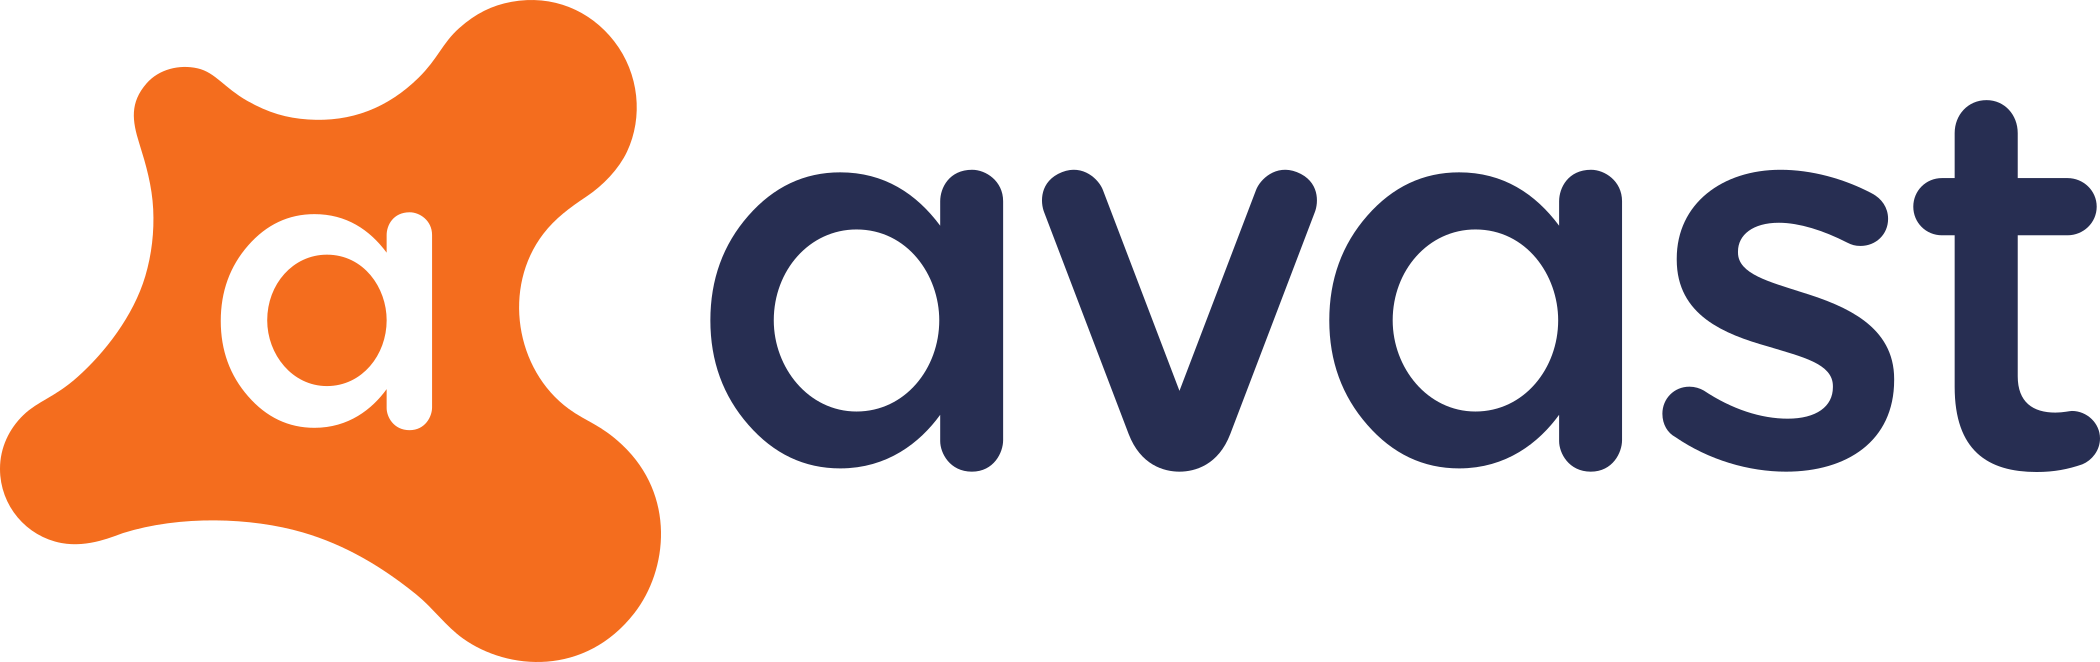 avast logo 2 - Avast Logo